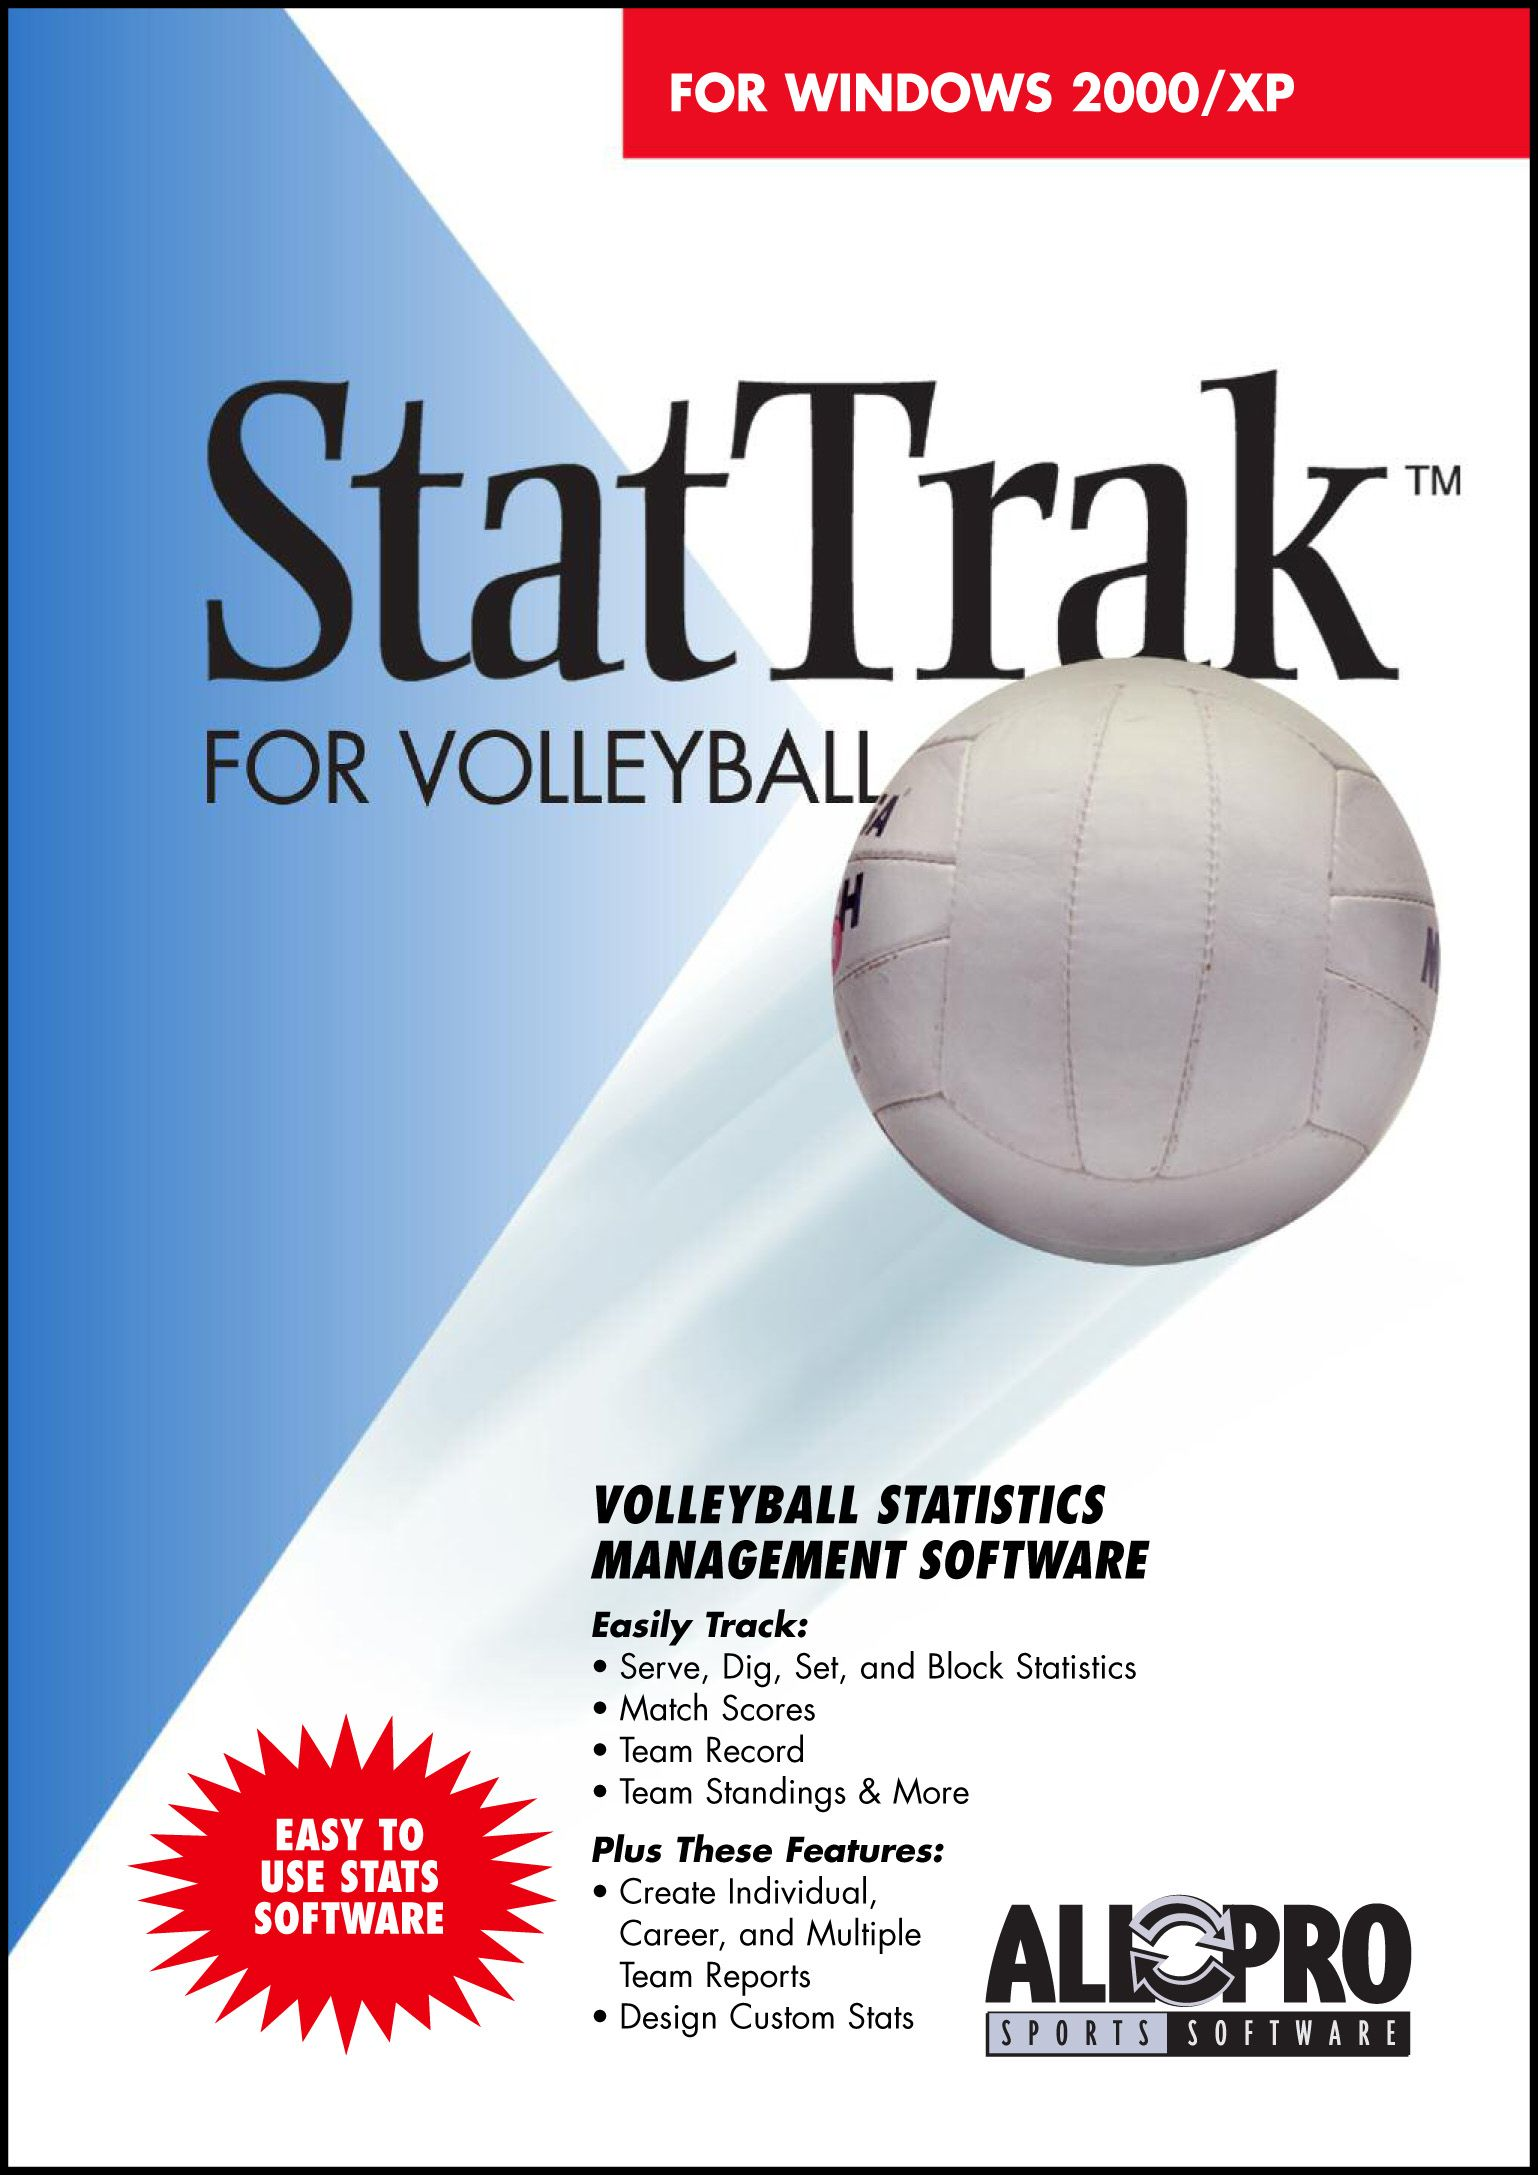 Rogai Info Software Details For Stattrak For Volleyball 6 0 Volleyball Match Score Software